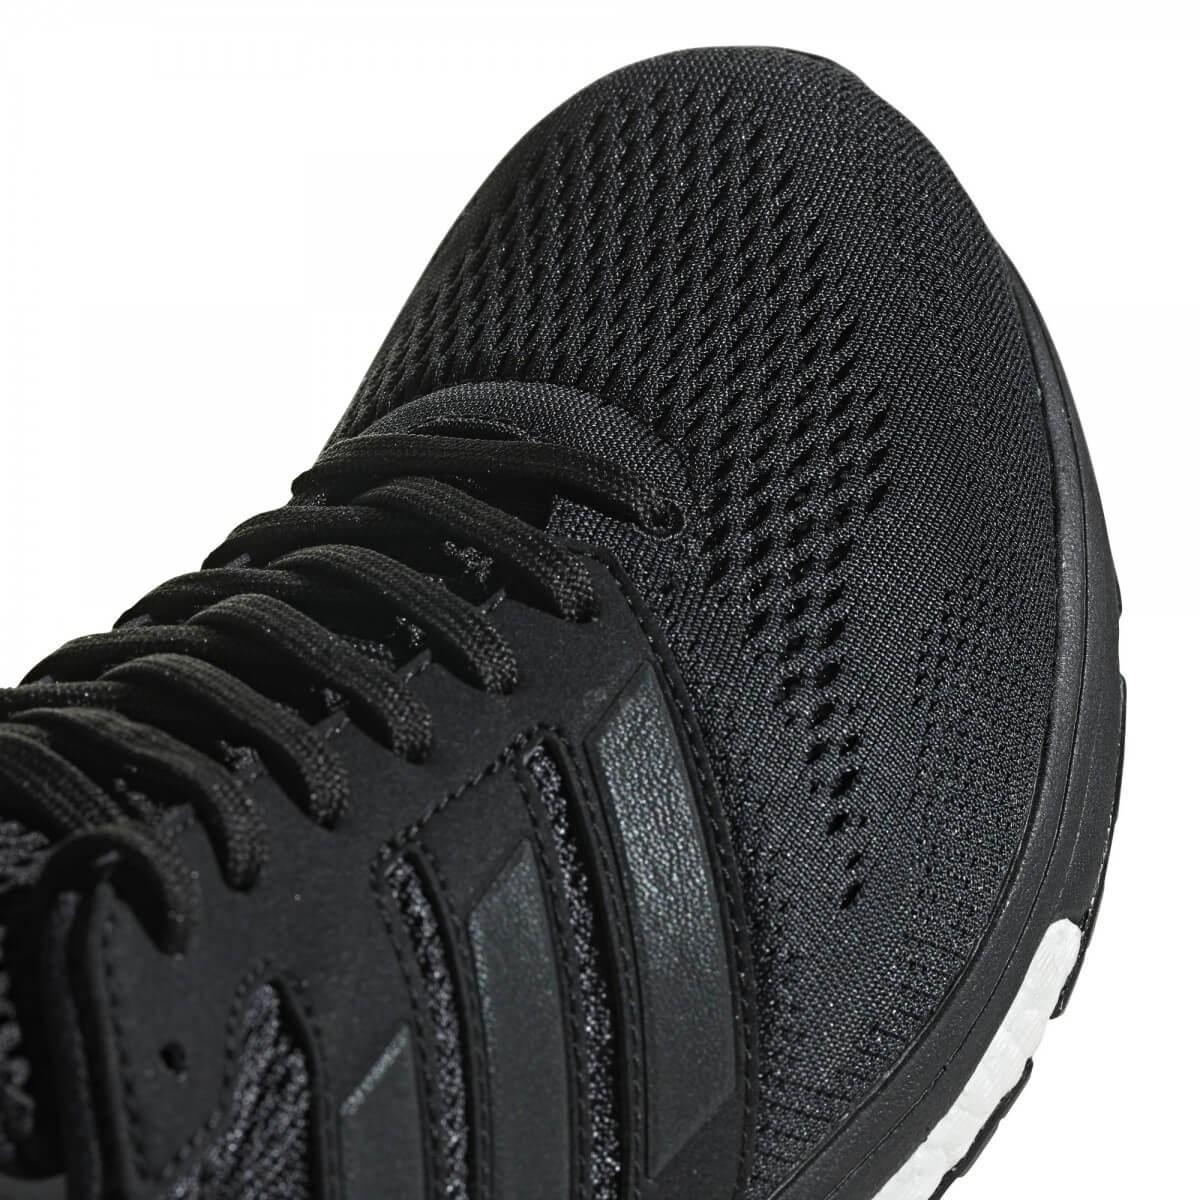 sports shoes 59b69 0e536 ... Adidas Adizero Boston 7 Negras Carbon OI18 Hombre ...